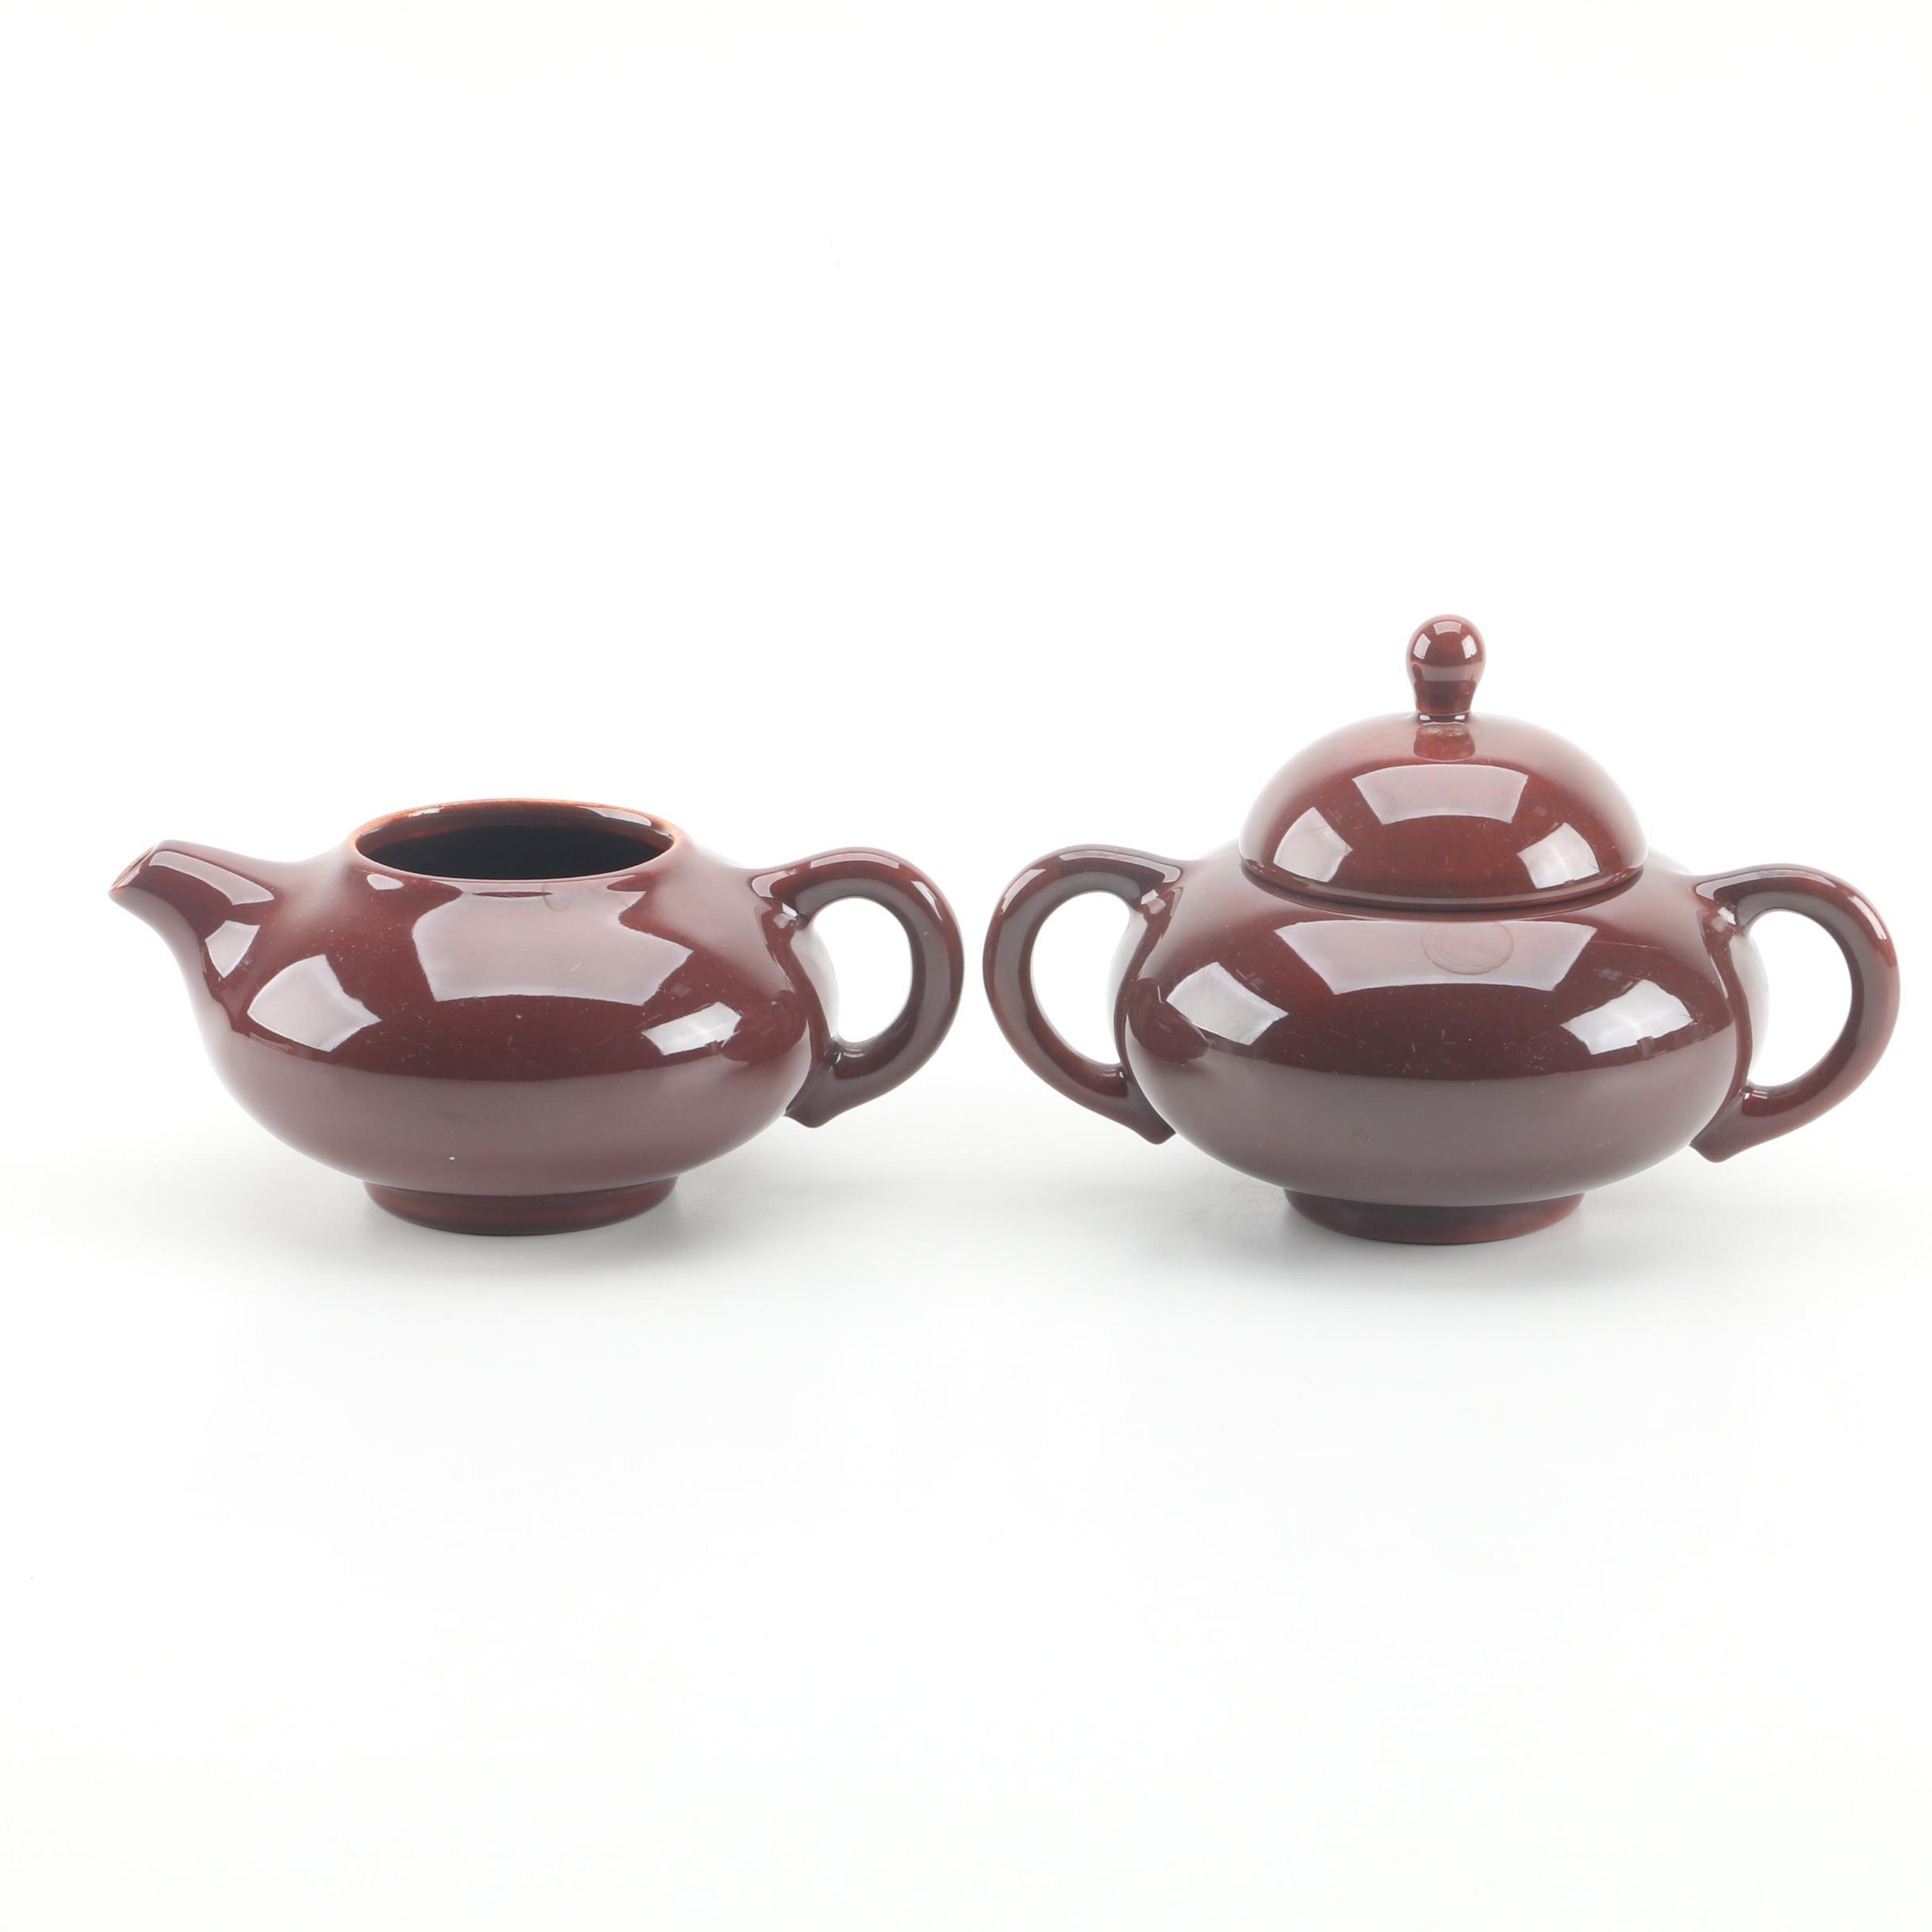 Vintage Gladding-McBean California Pottery Sugar and Creamer Set